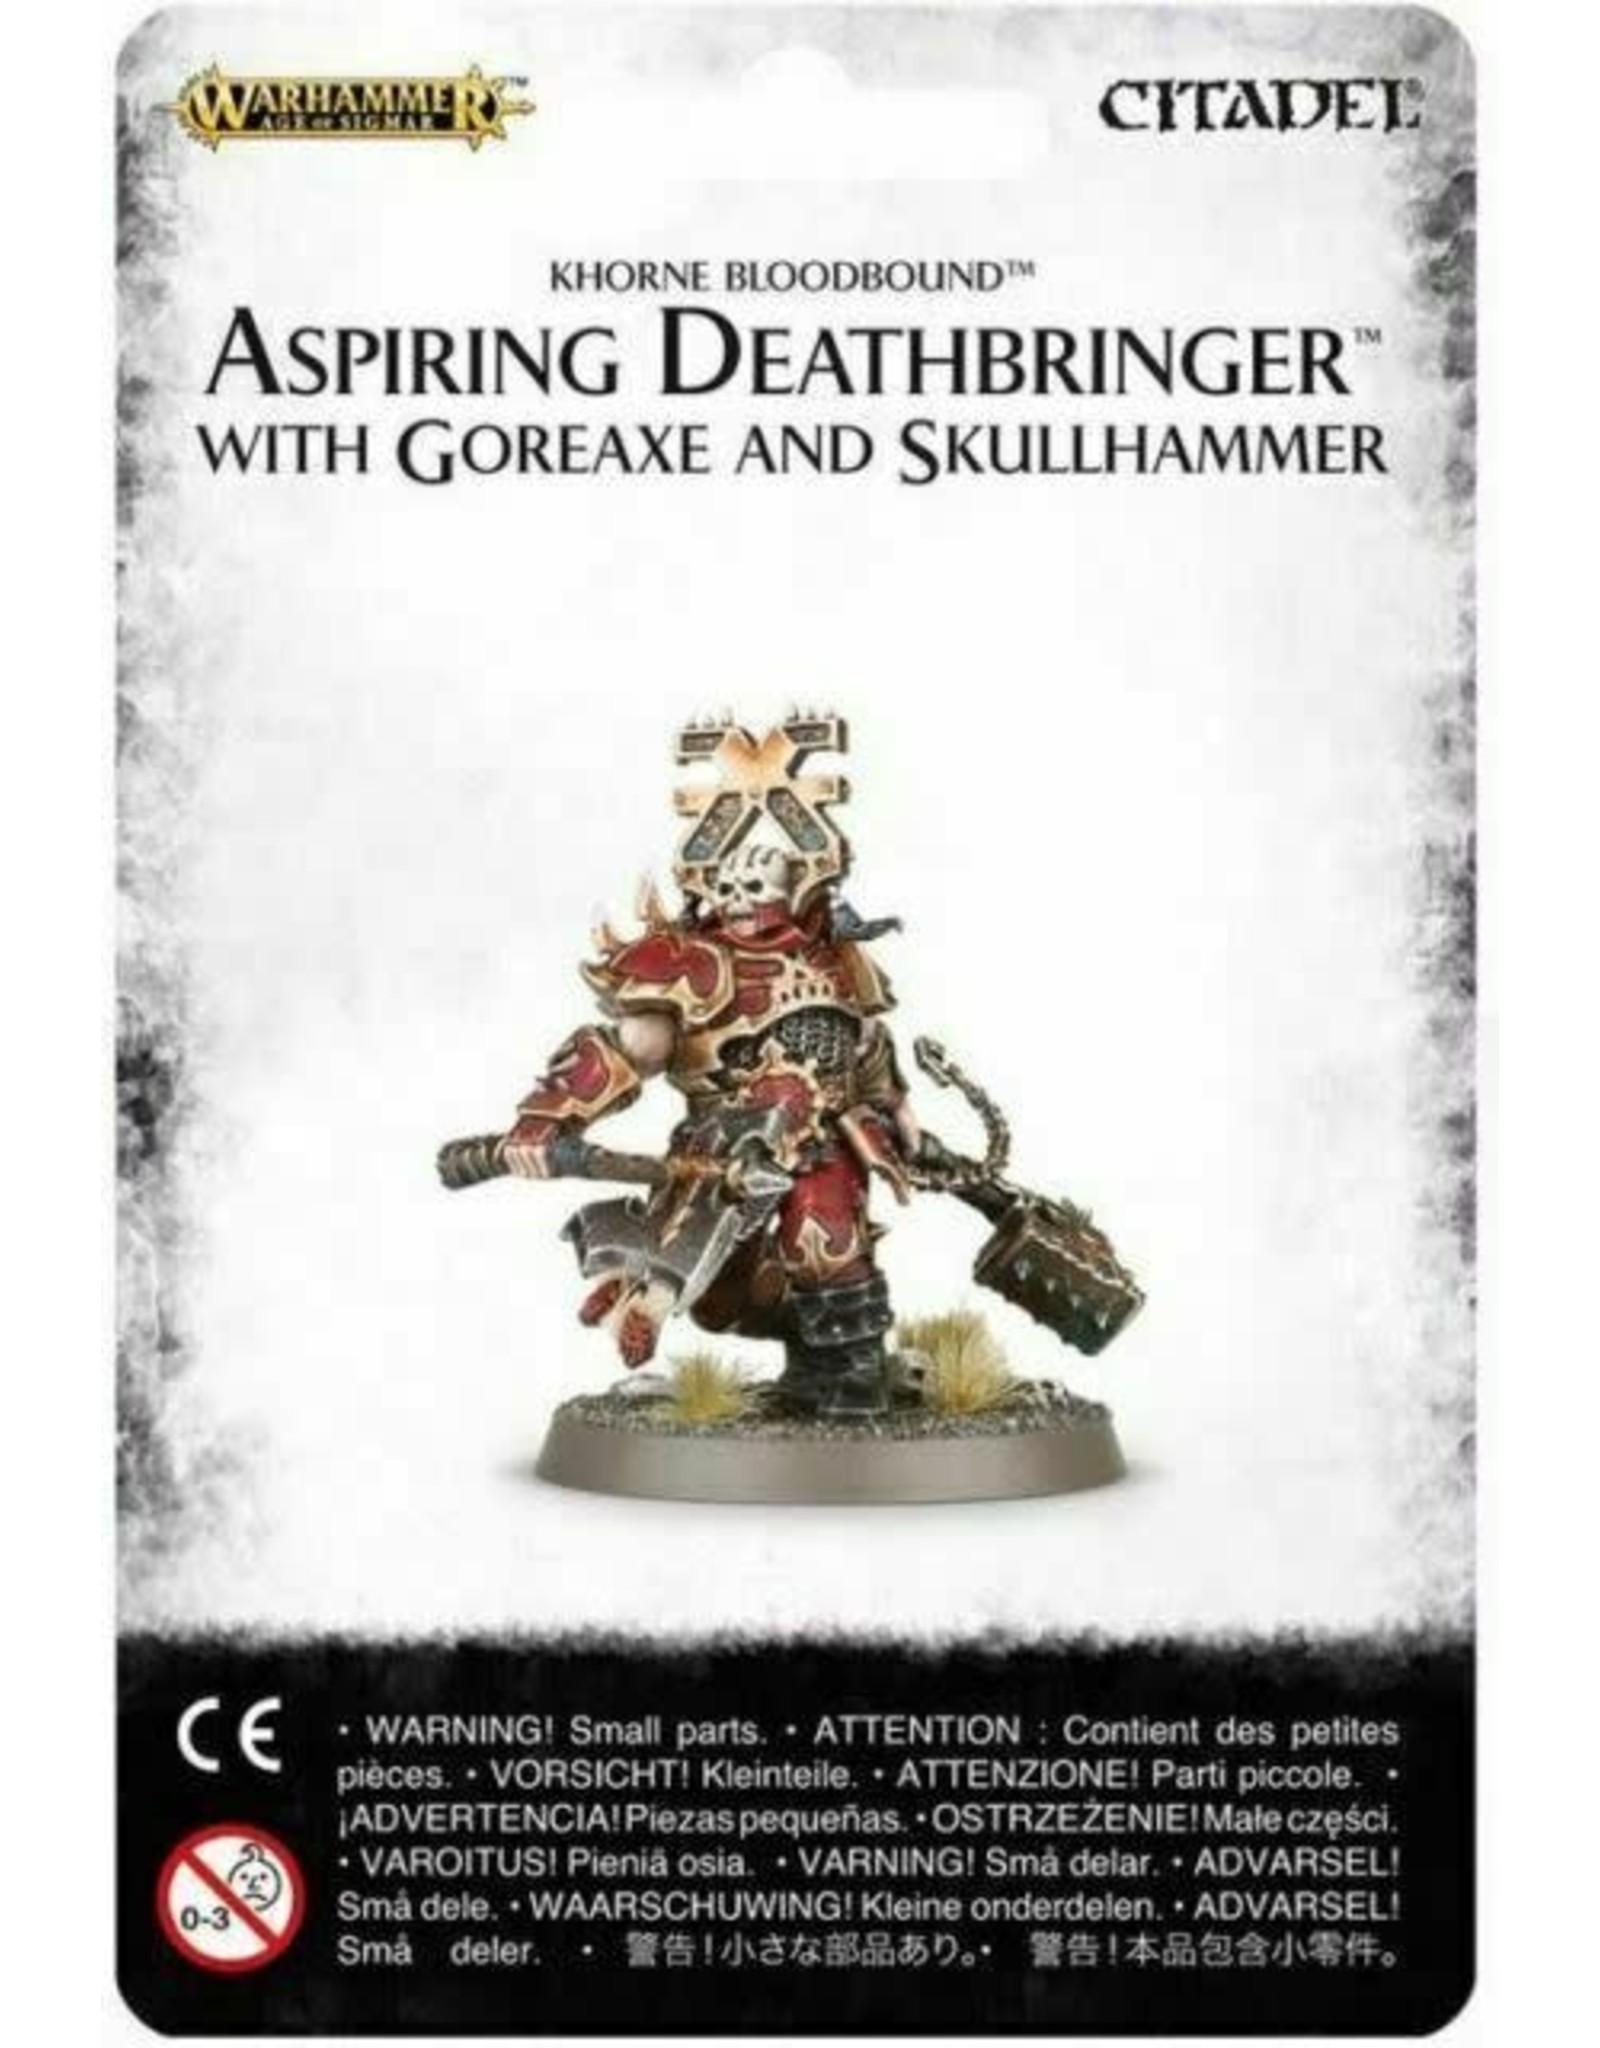 Games Workshop Aspiring Deathbringer with Goreaxe